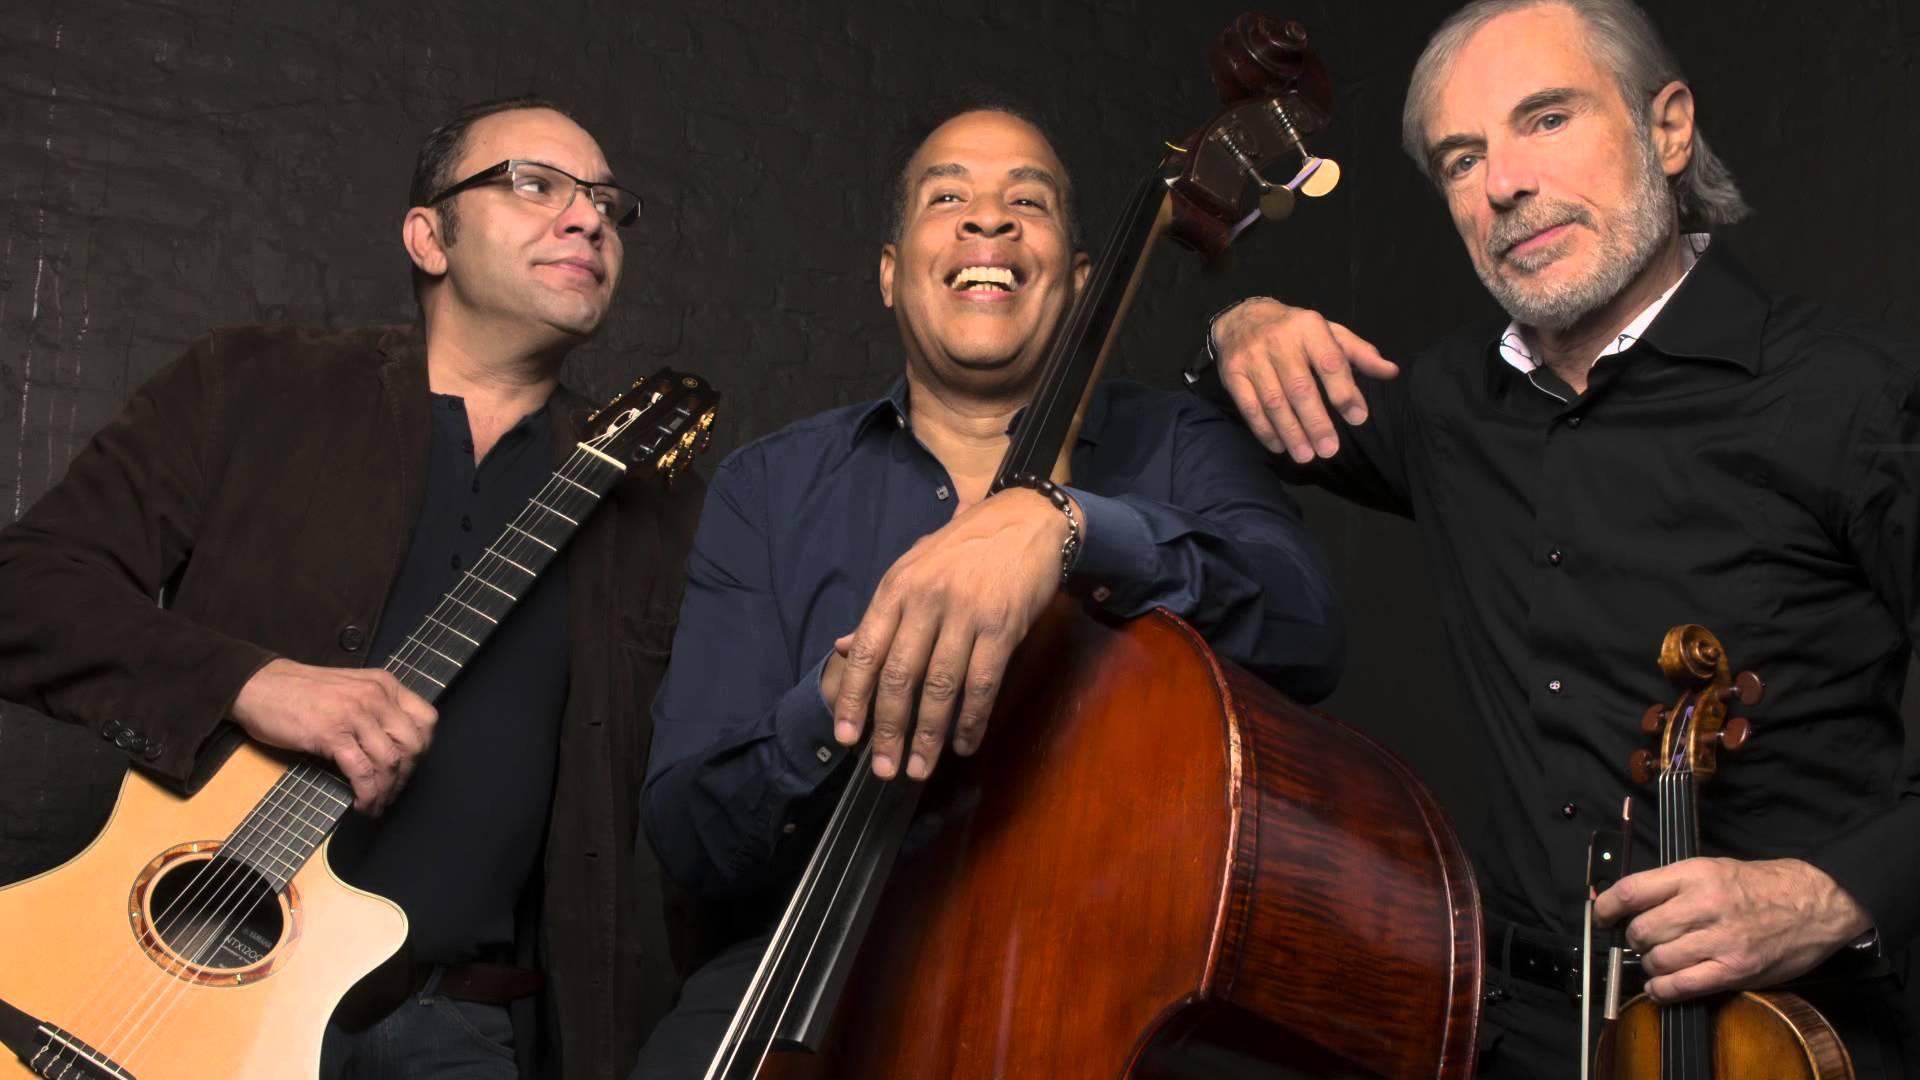 Jean Luc Ponty, Biréli Lagrène y Kyle Eastwood jazz vitoria